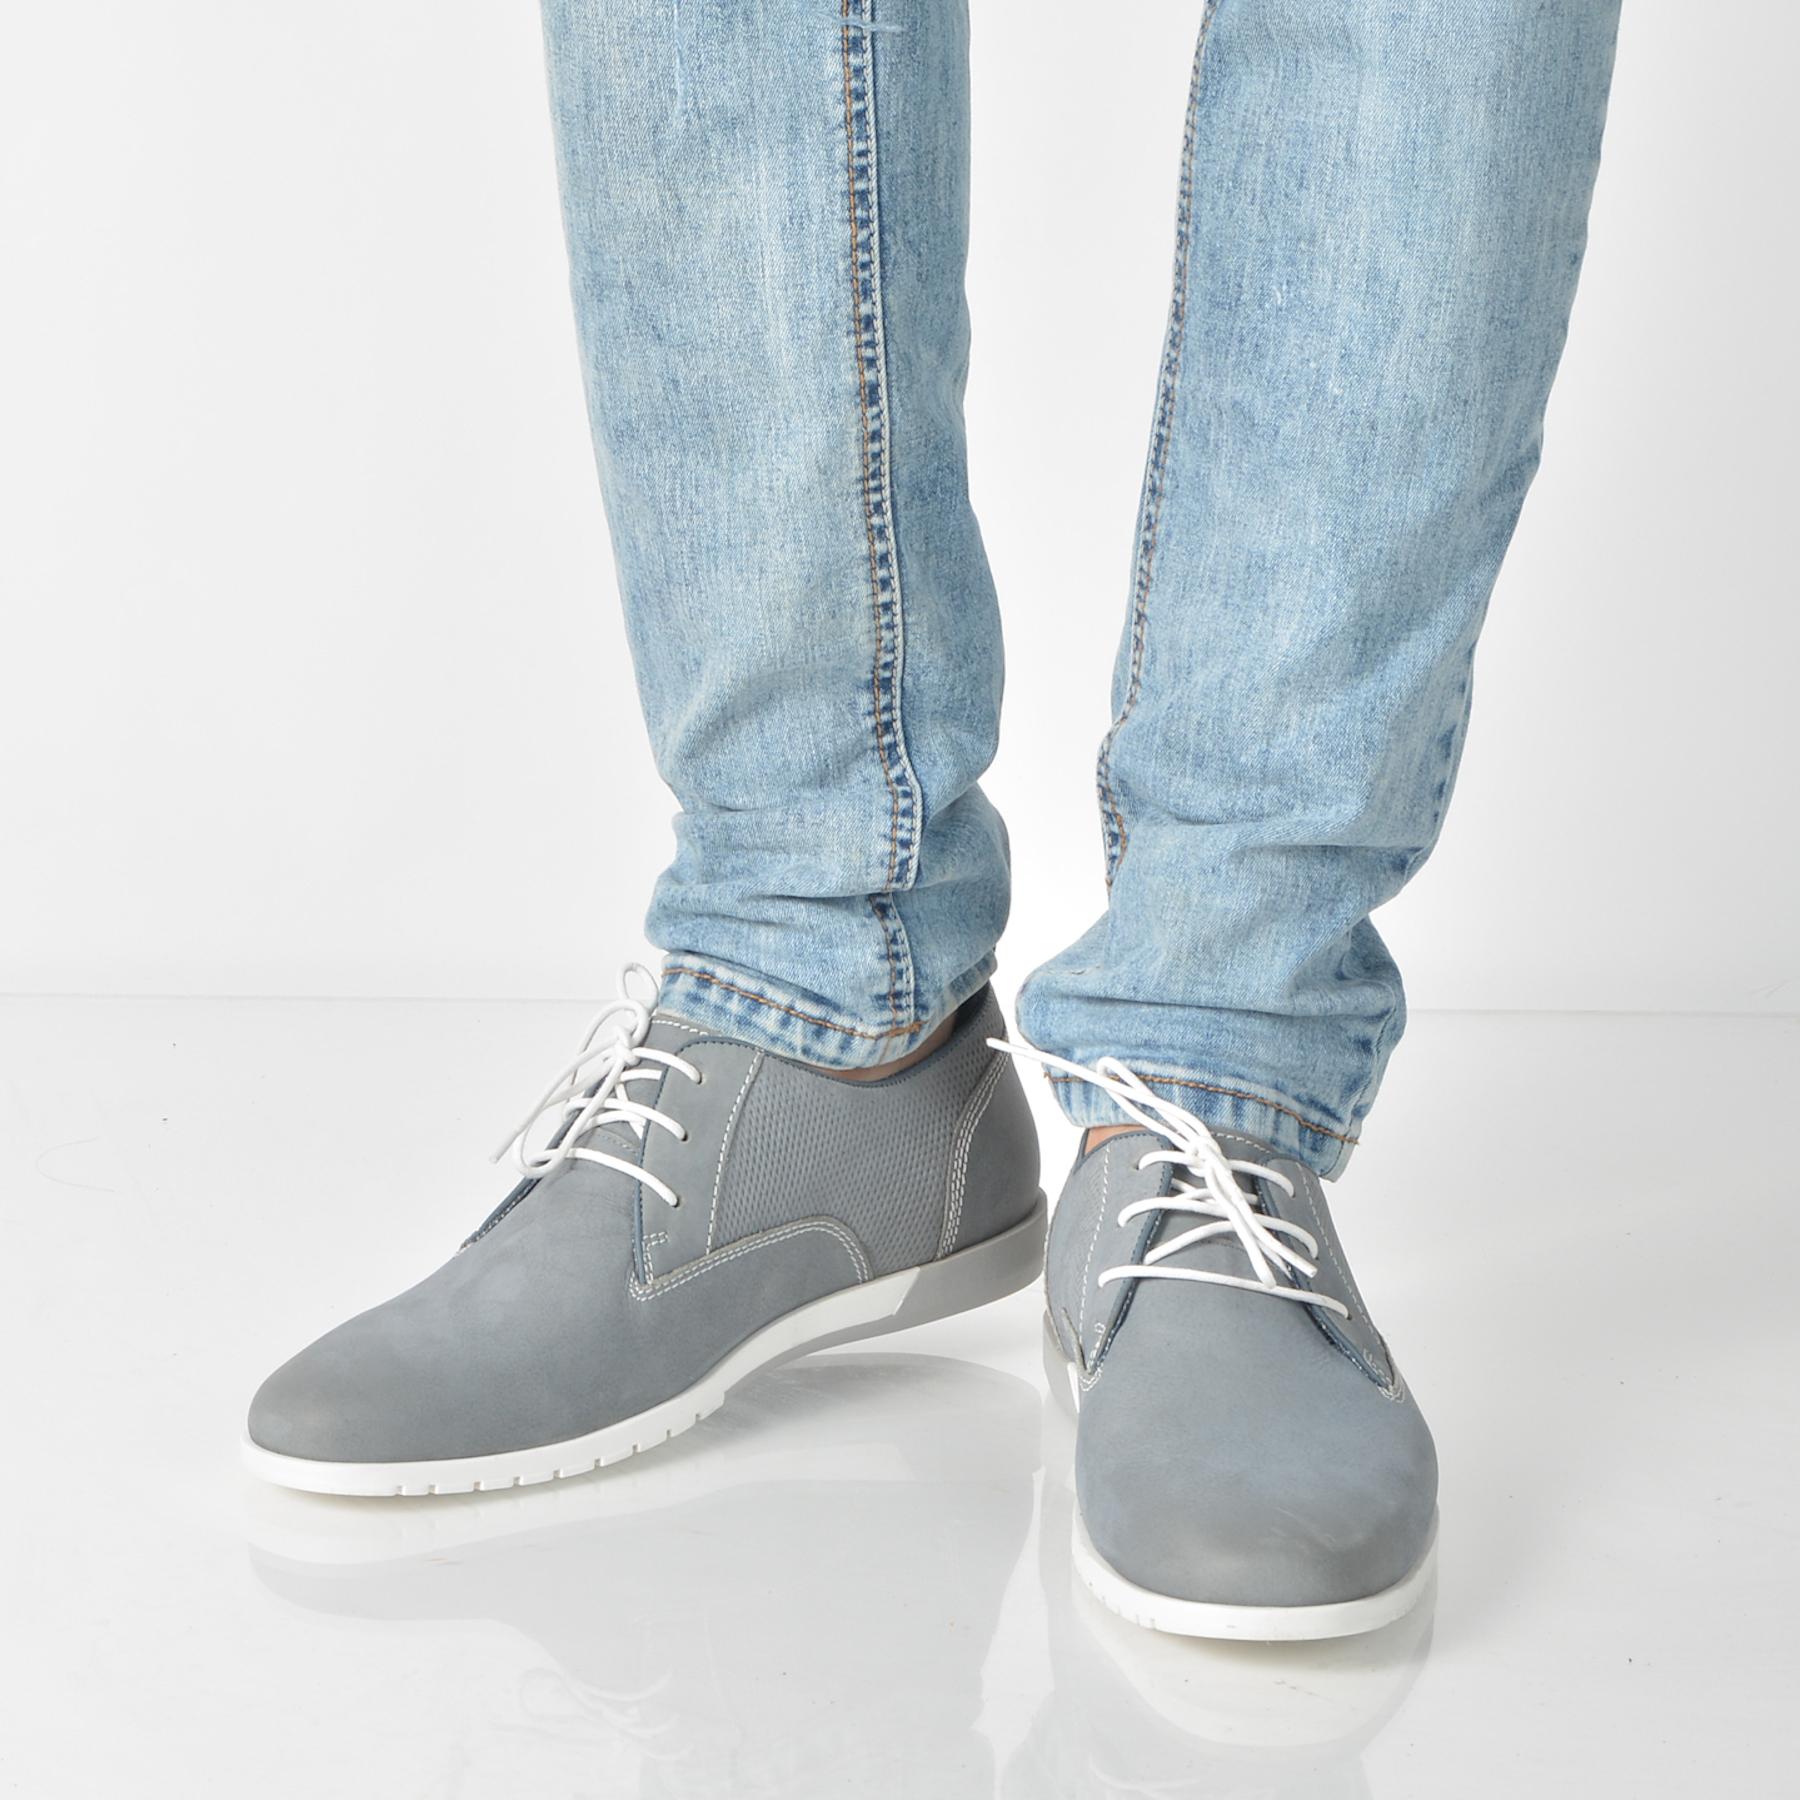 Pantofi Otter Gri, 4210, Din Nabuc